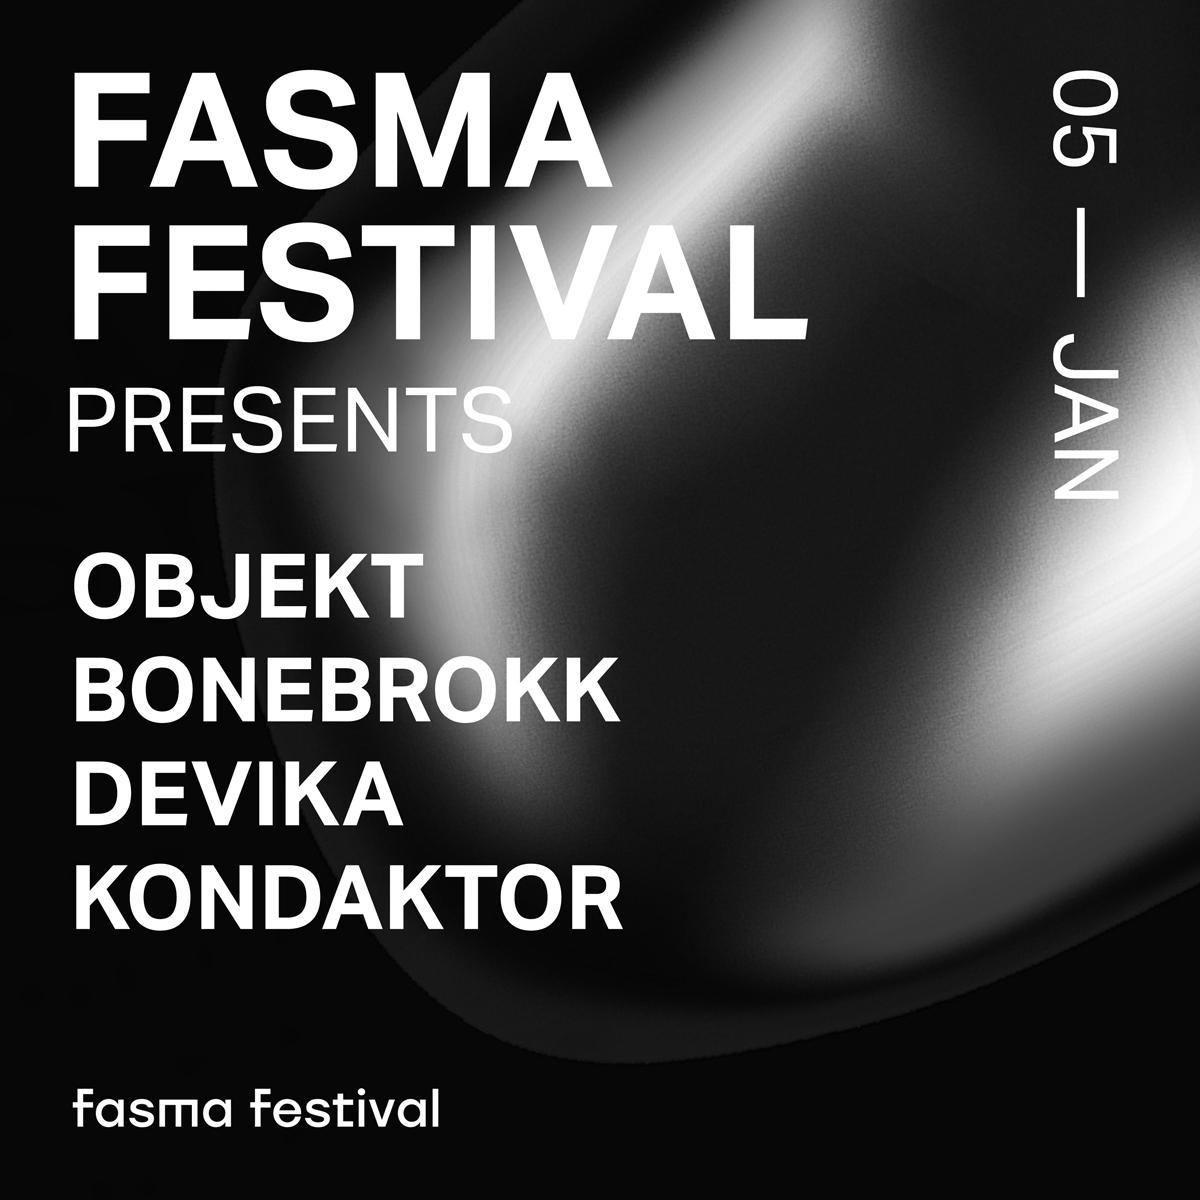 FASMA Festival 2017 - Pre Event